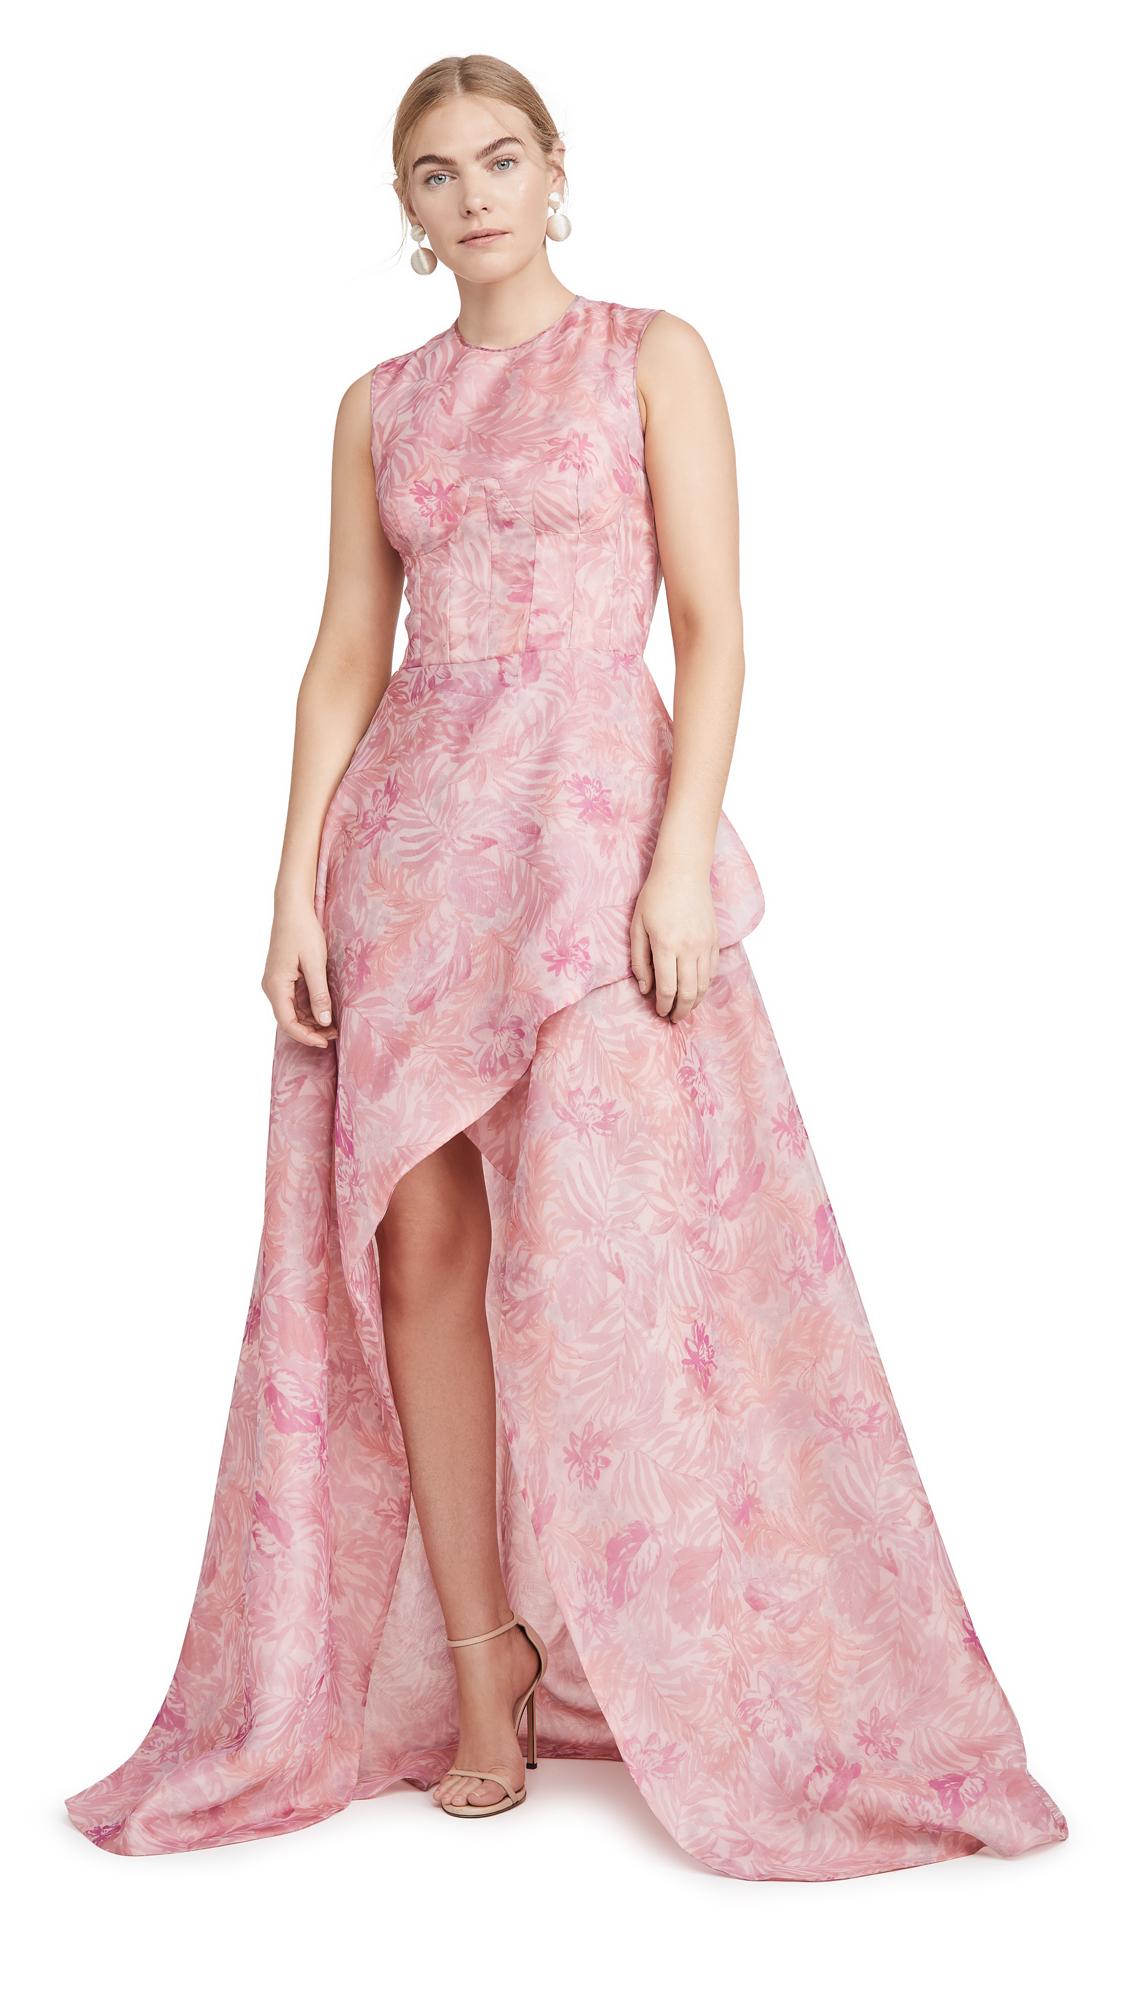 Buy Costarellos Sleeveless Printed Organza Tulip Dress online beautiful Costarellos Dresses, Strapless